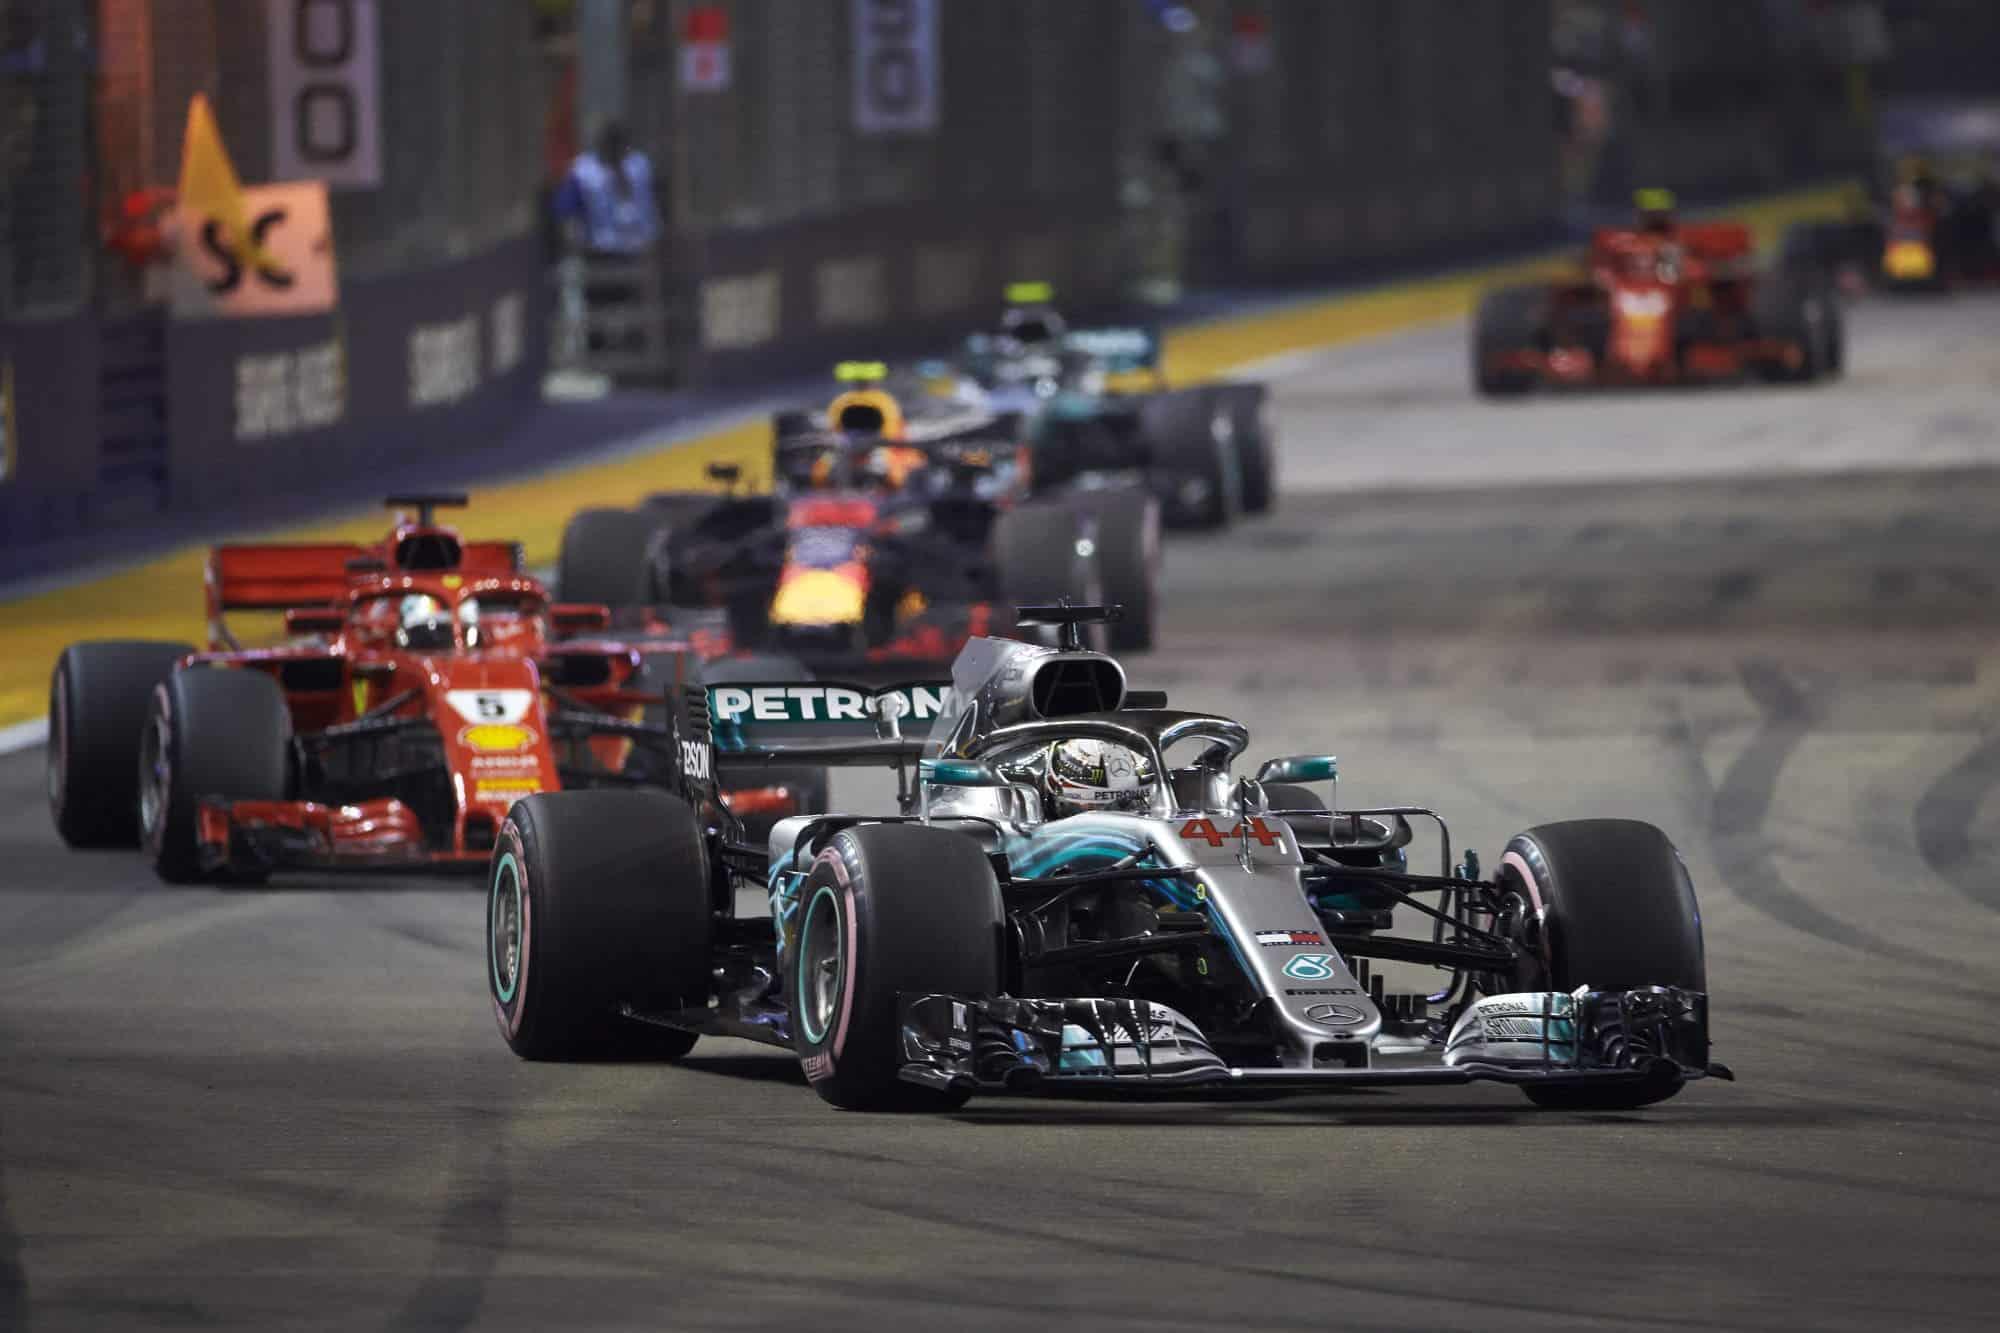 2018 Singapore GP start Hamilton leads Photo Daimler